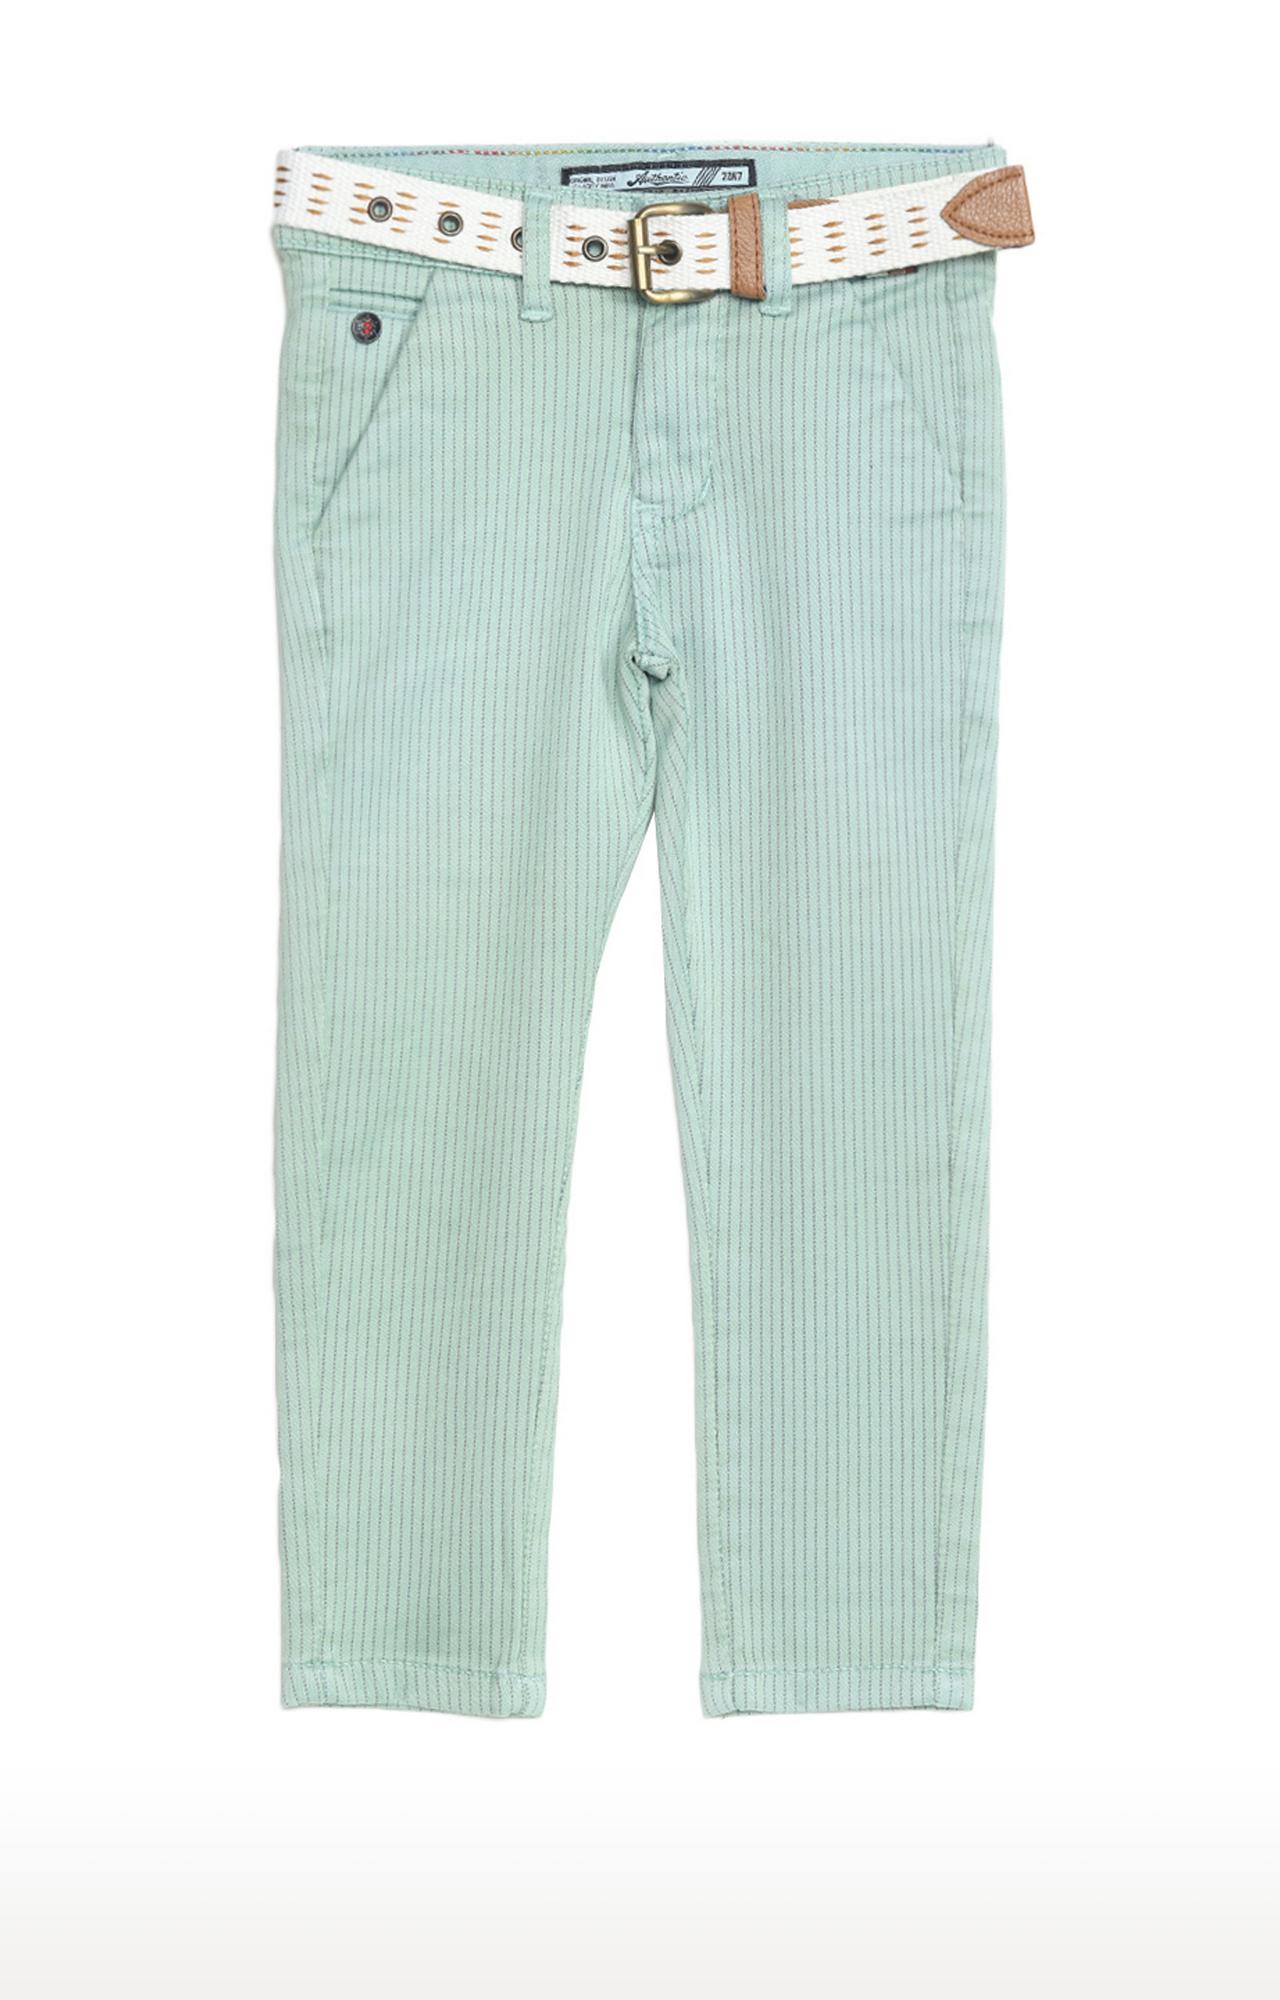 Tadpole | Pista Green Striped Regular-Fit Jeans